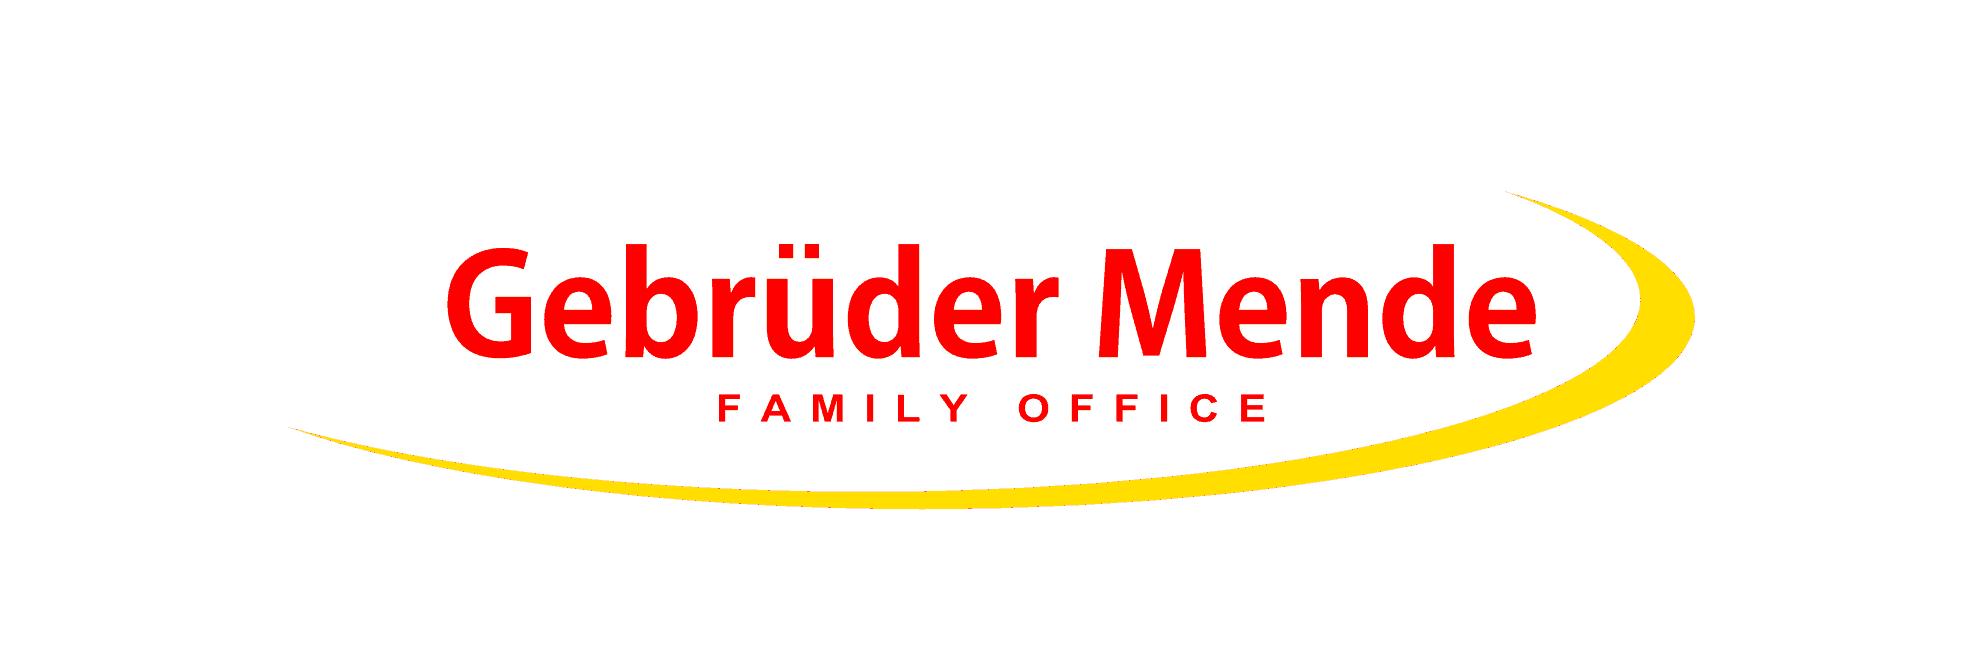 Gebrüder Mende FO GmbH & Co. KG